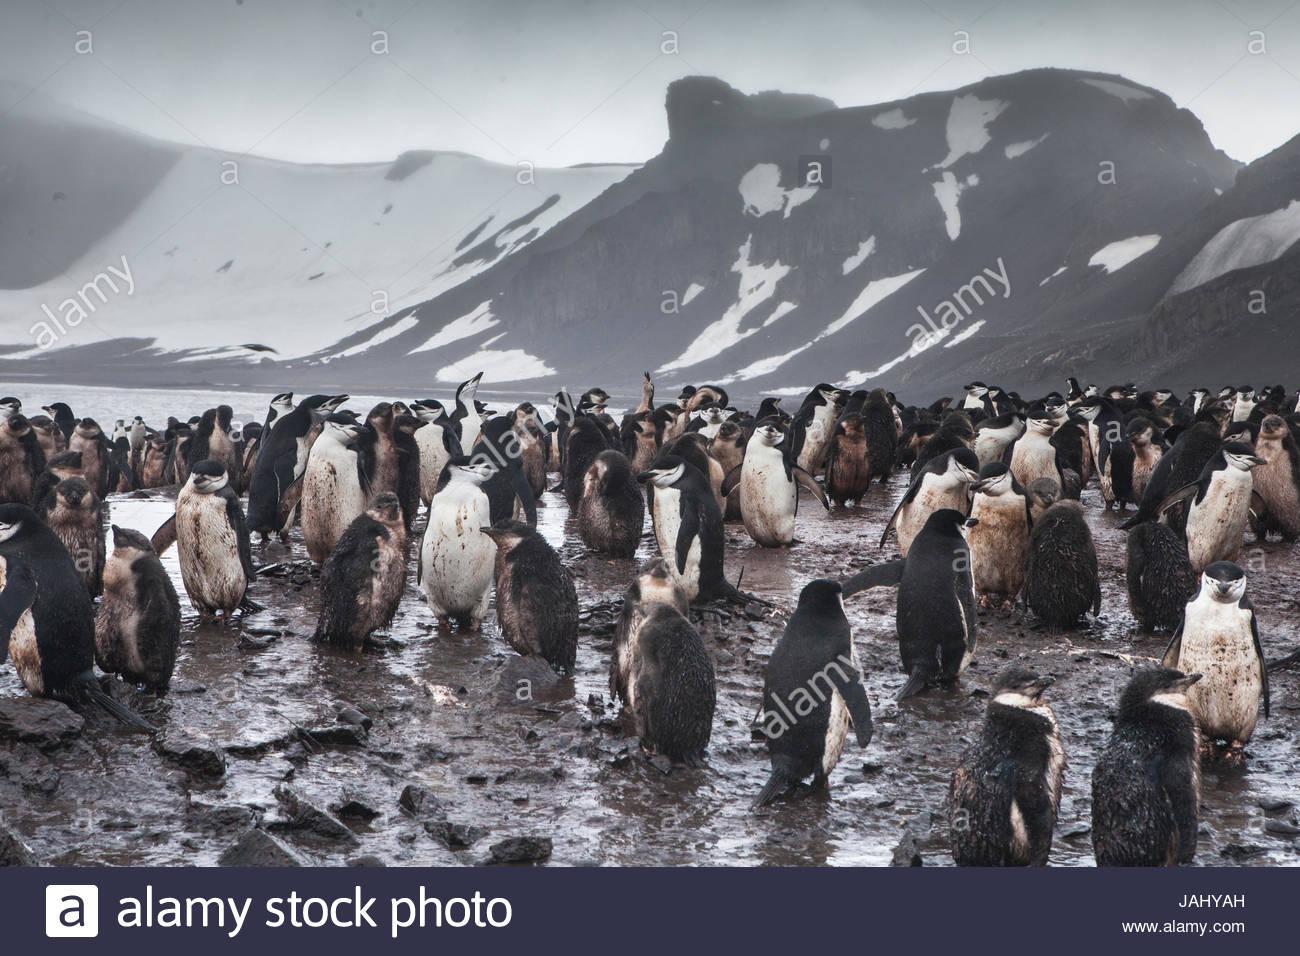 Gentoo penguins, Pygoscelis papua, in their very messy rookery on a mountainous coast. - Stock Image